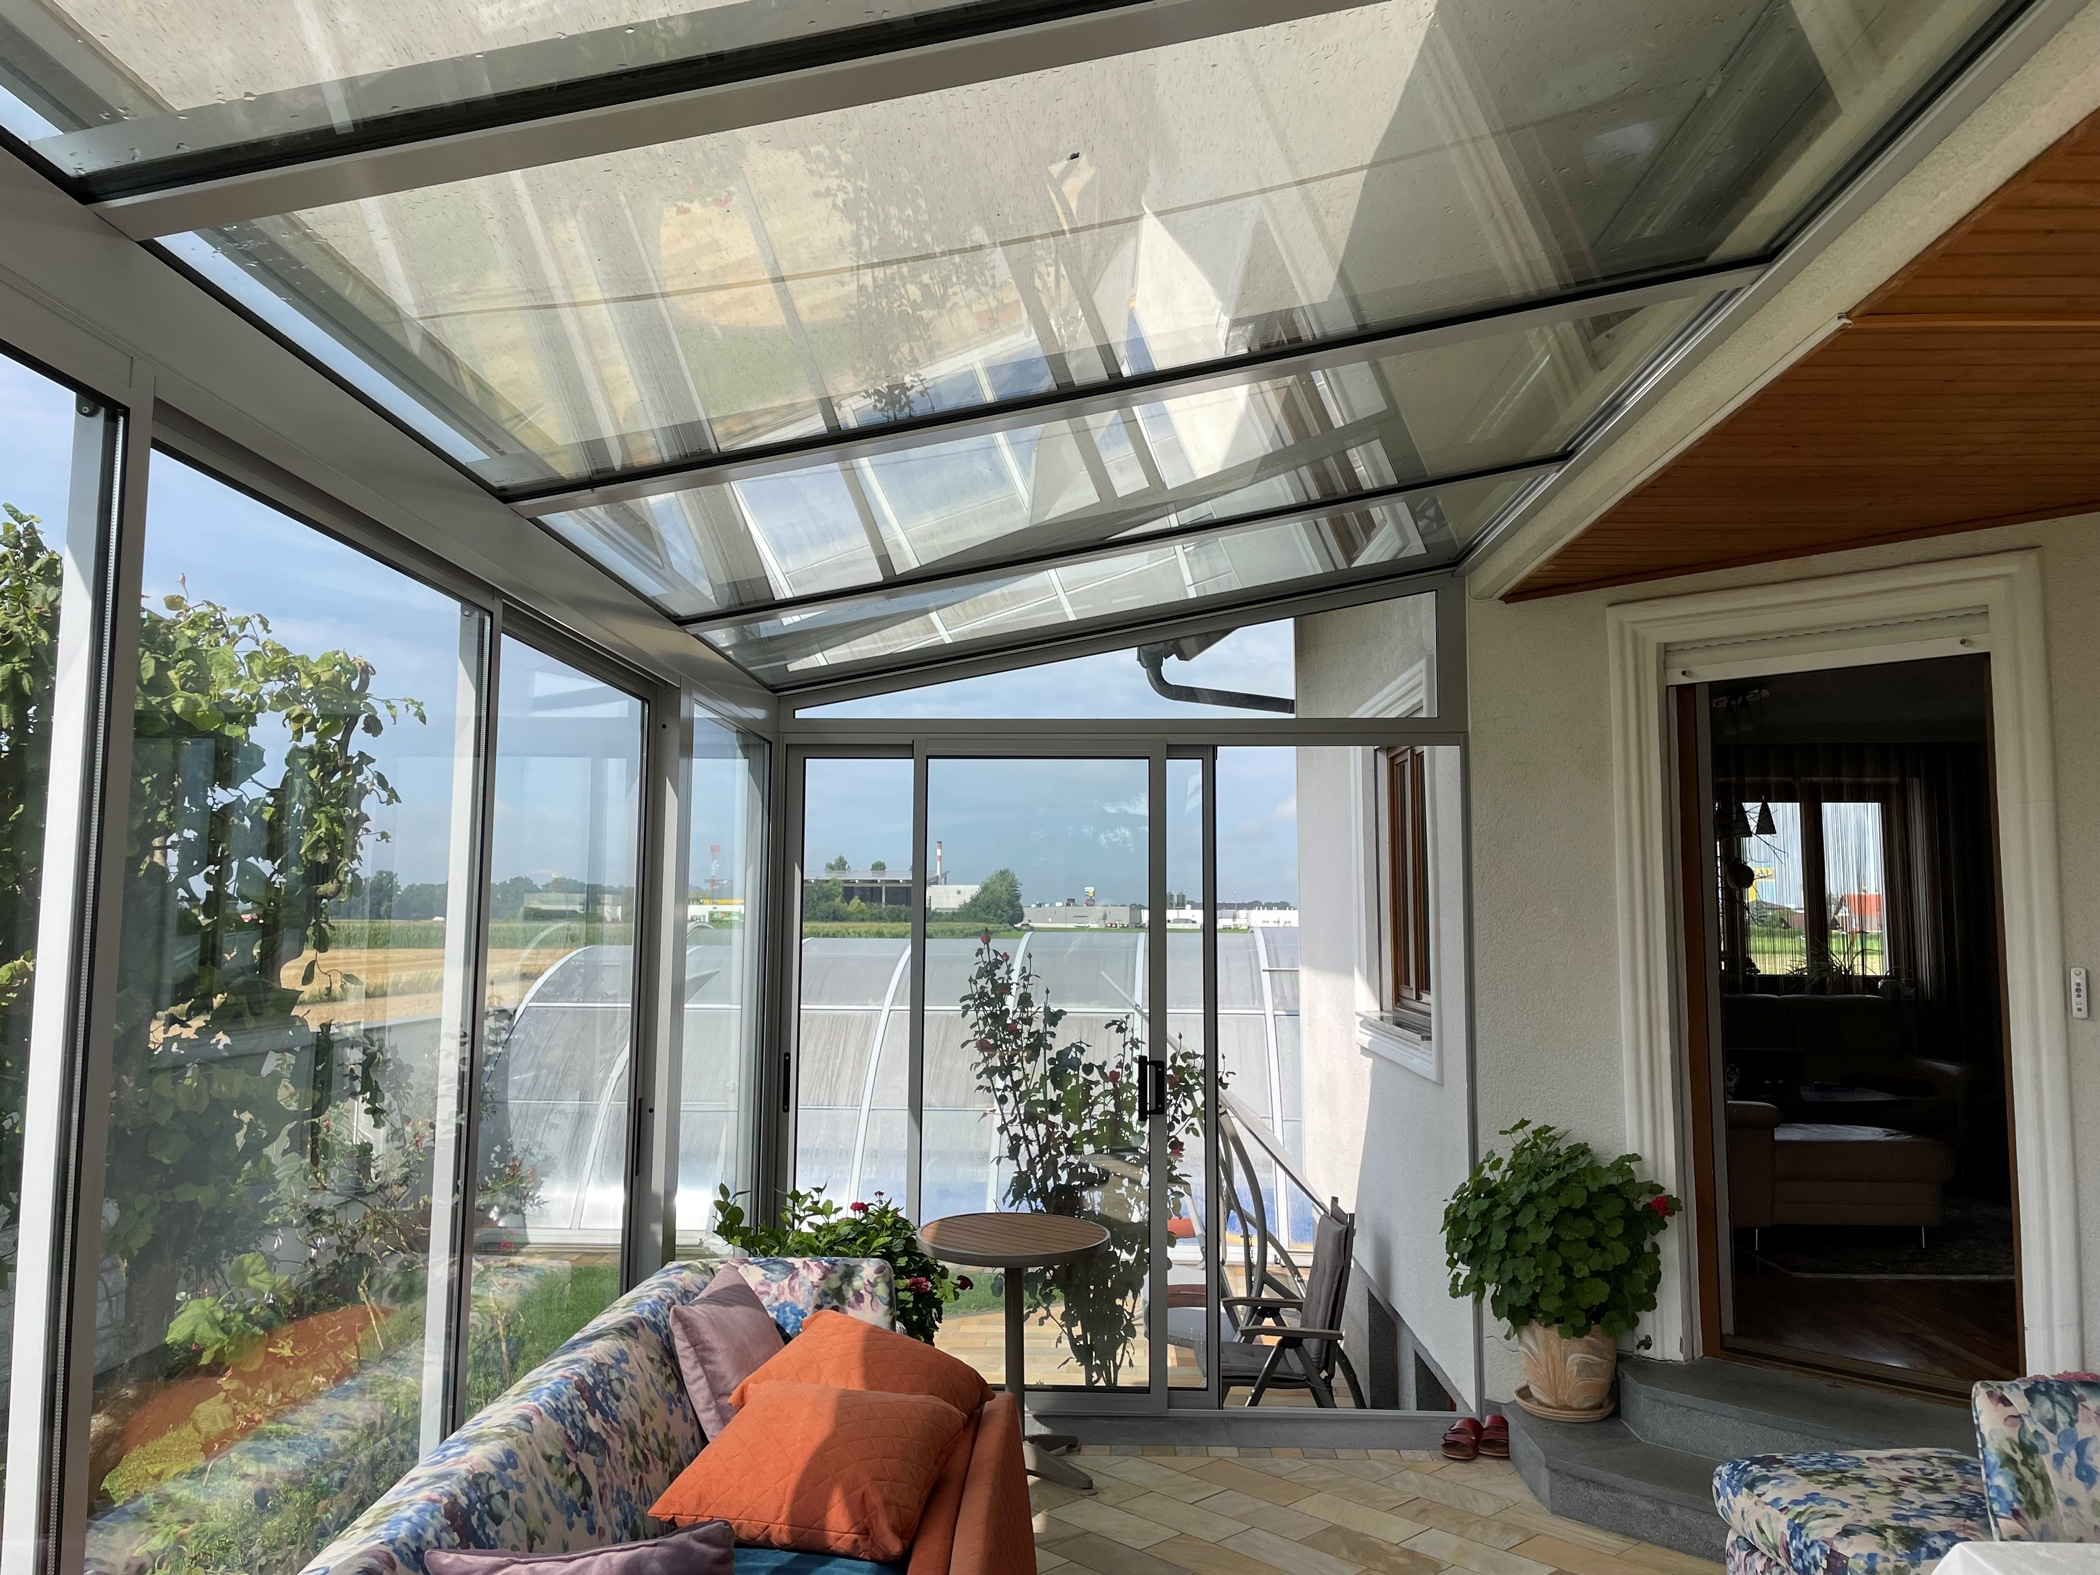 Wintergarten Chill-Lounge in grau in 4320 Perg montiert